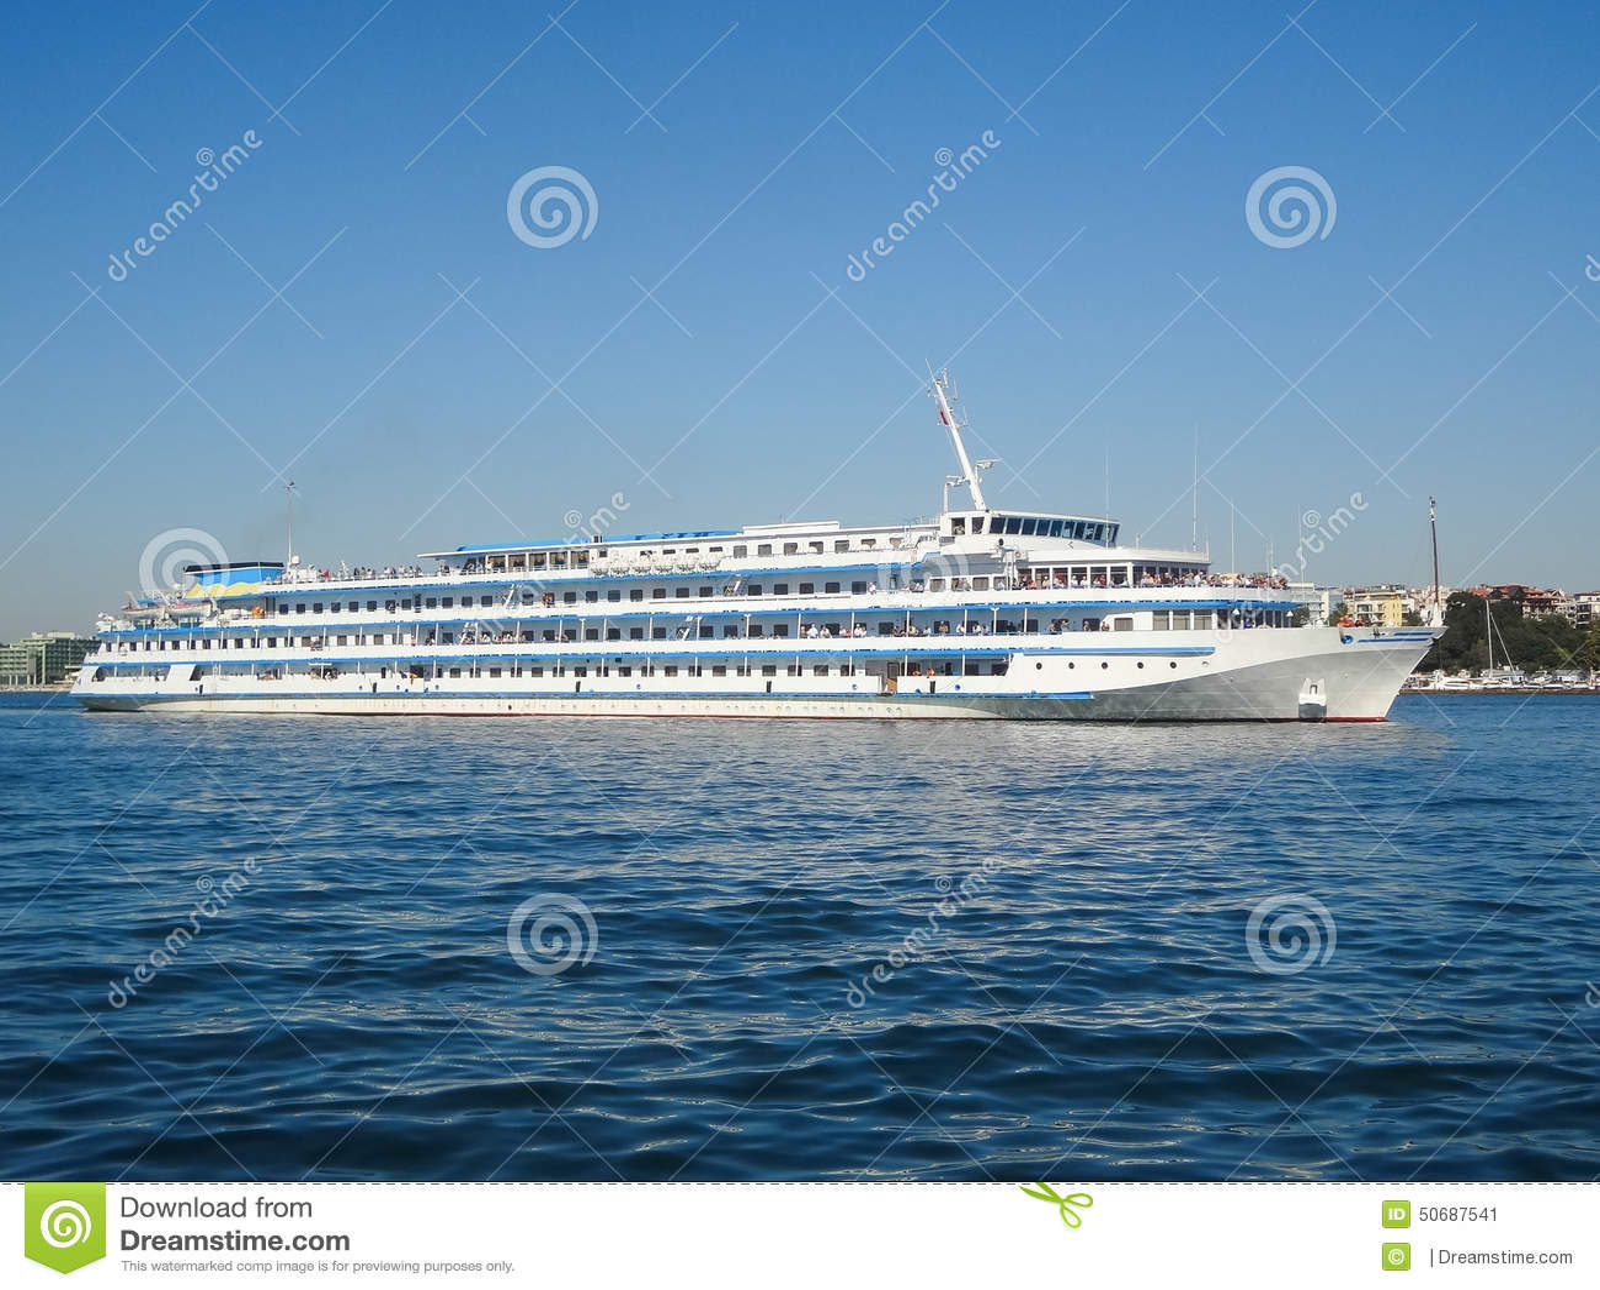 Download 河船 库存图片. 图片 包括有 背包, 城镇, 建造者, 巡航, 行程, 横向, beautifuler - 50687541